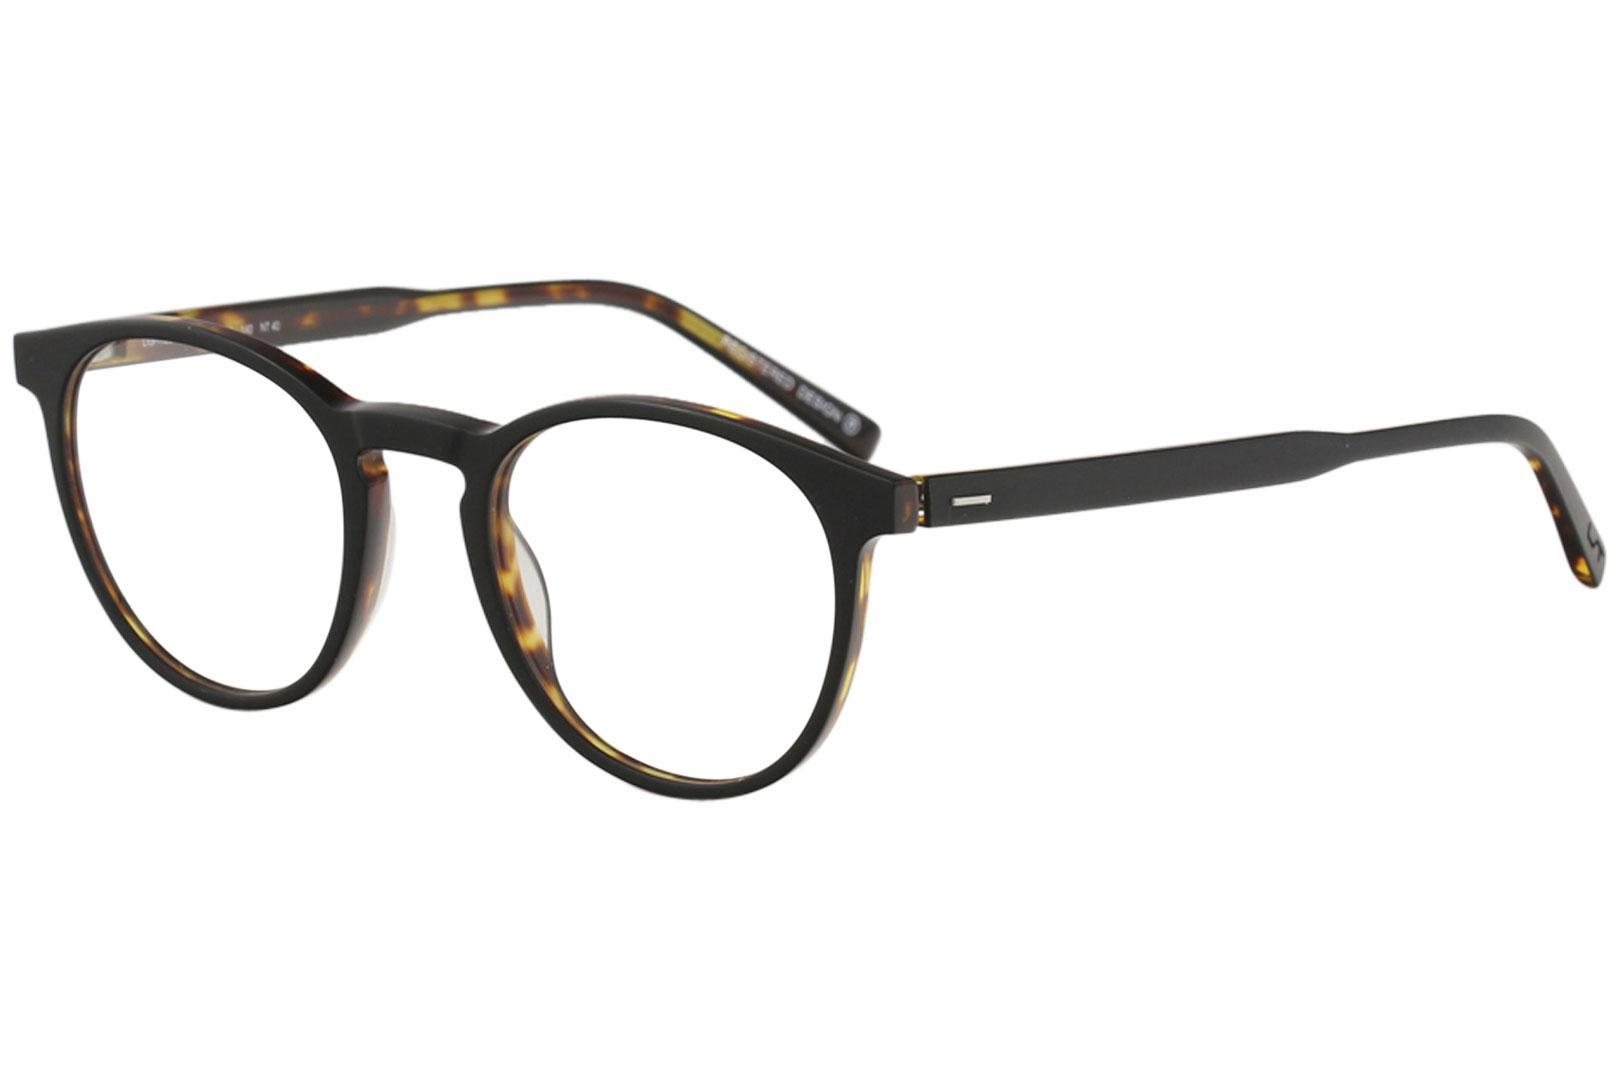 Image of Morel Men's Eyeglasses Lightec 30004L 30004/L Full Rim Optical Frame - Black - Lens 47 Bridge 21 Temple 140mm